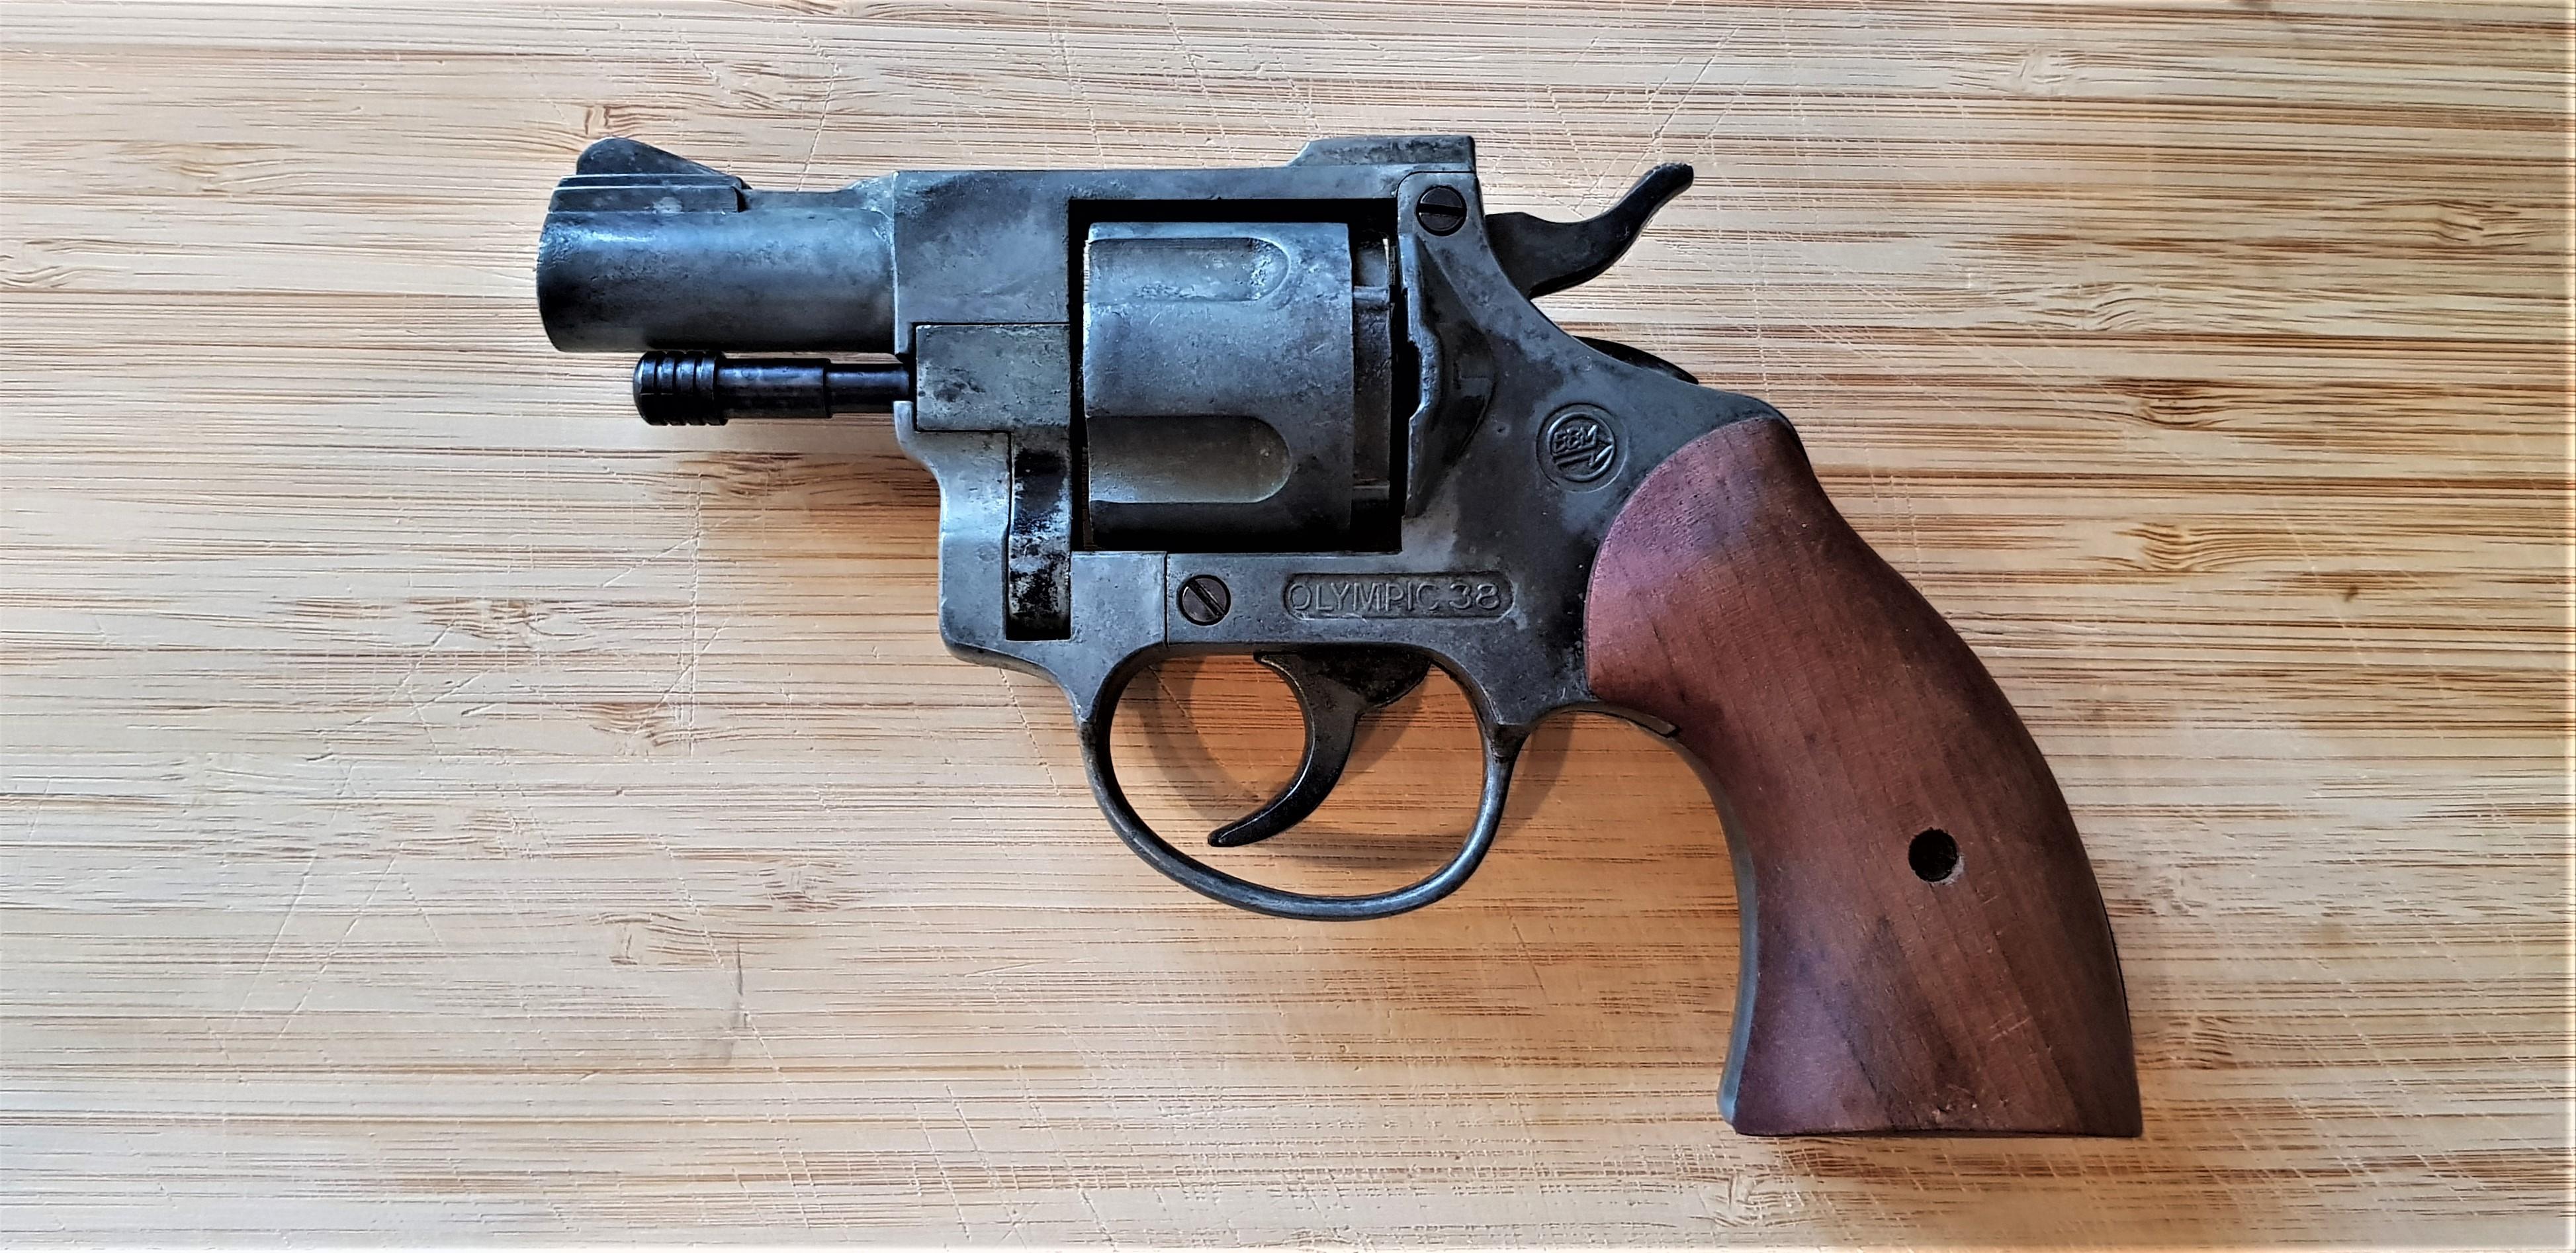 Snubby Revolver - Blank Fire